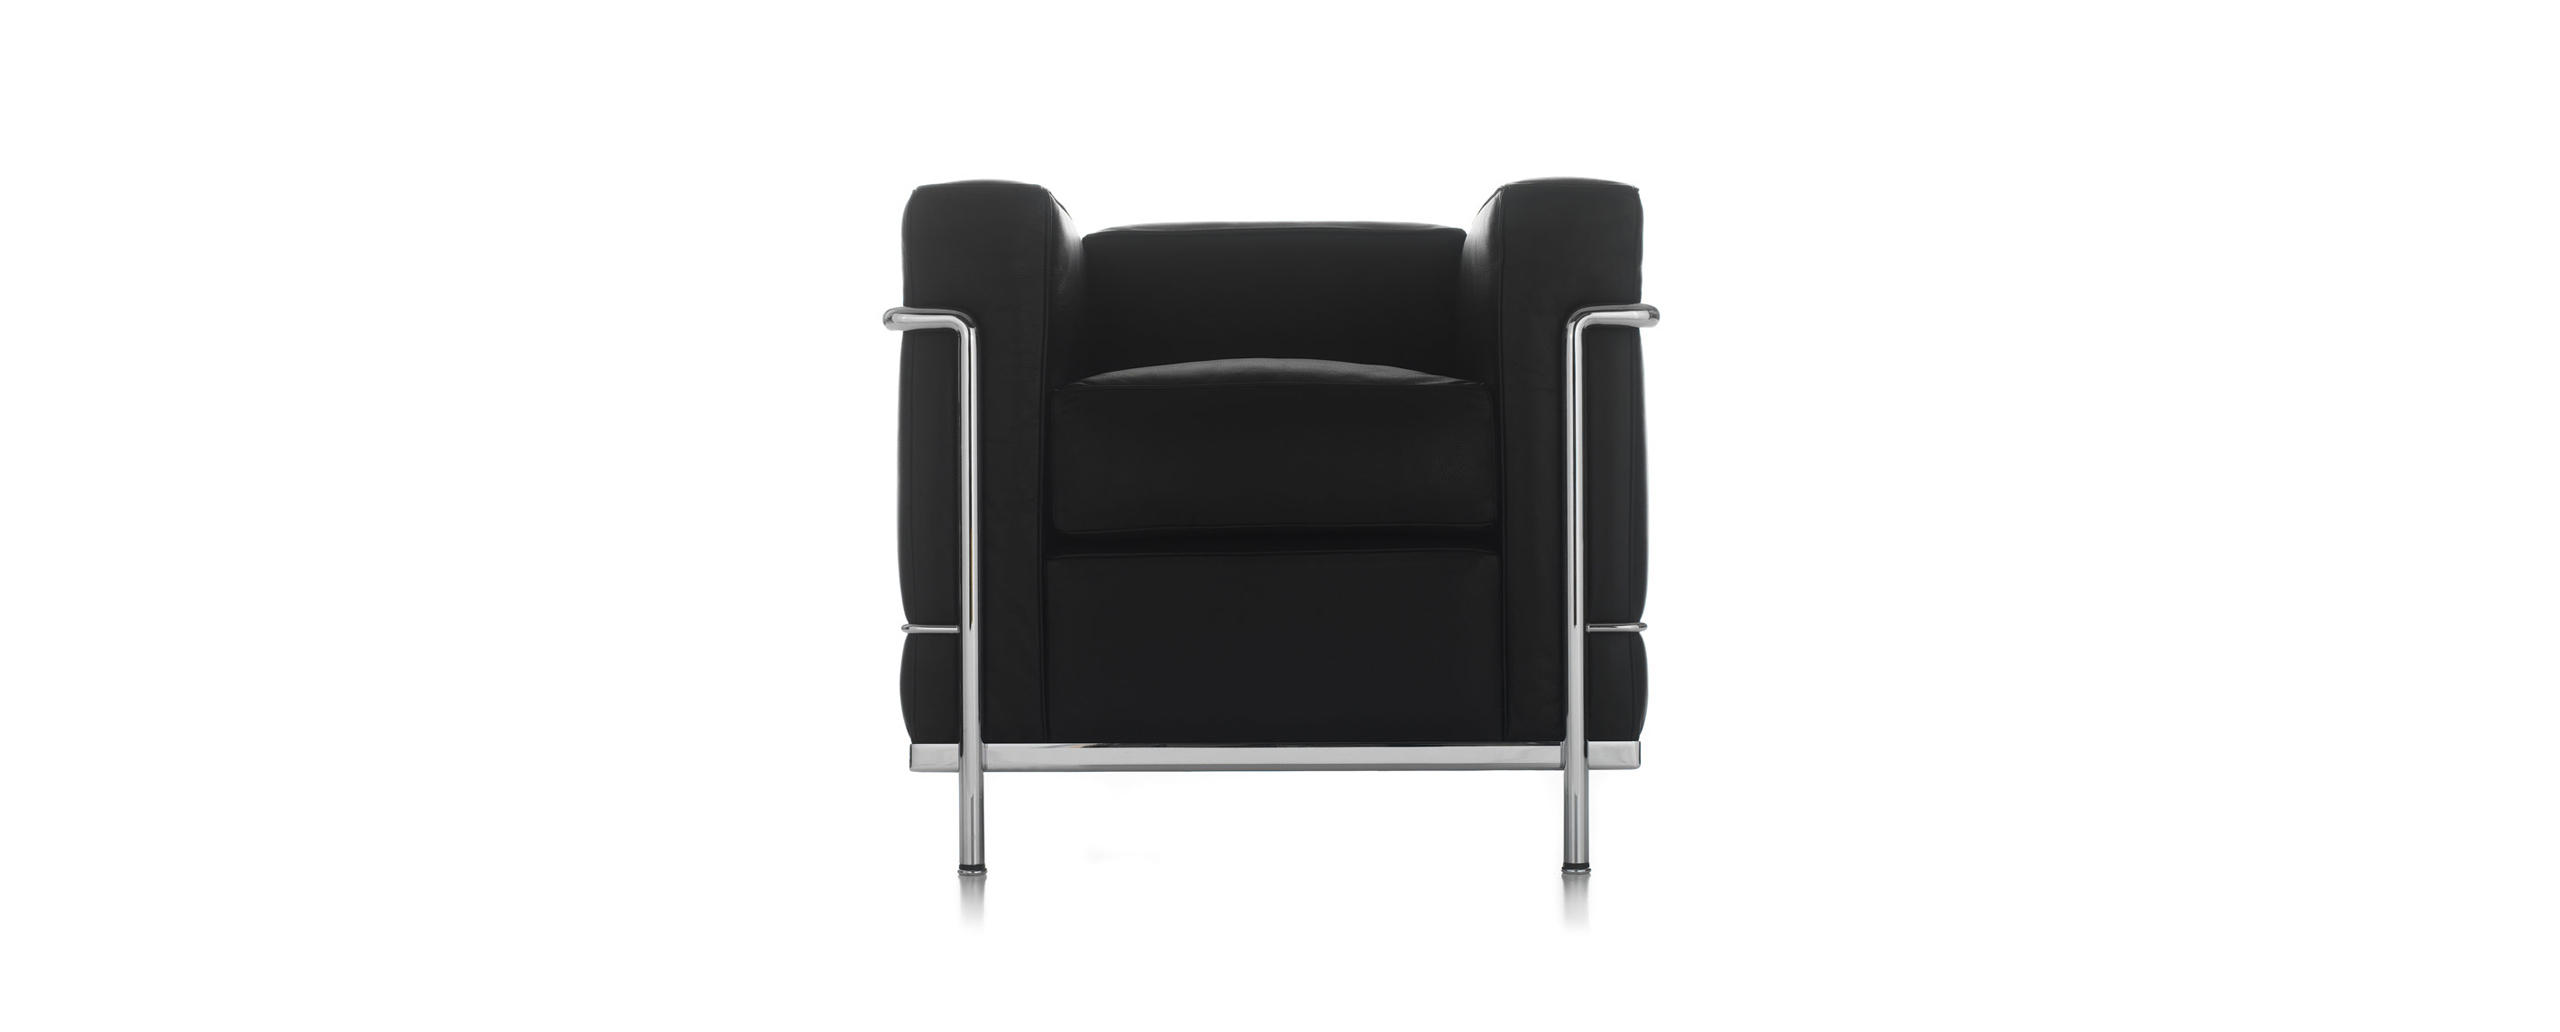 beautiful le corbusier cassina gallery. Black Bedroom Furniture Sets. Home Design Ideas